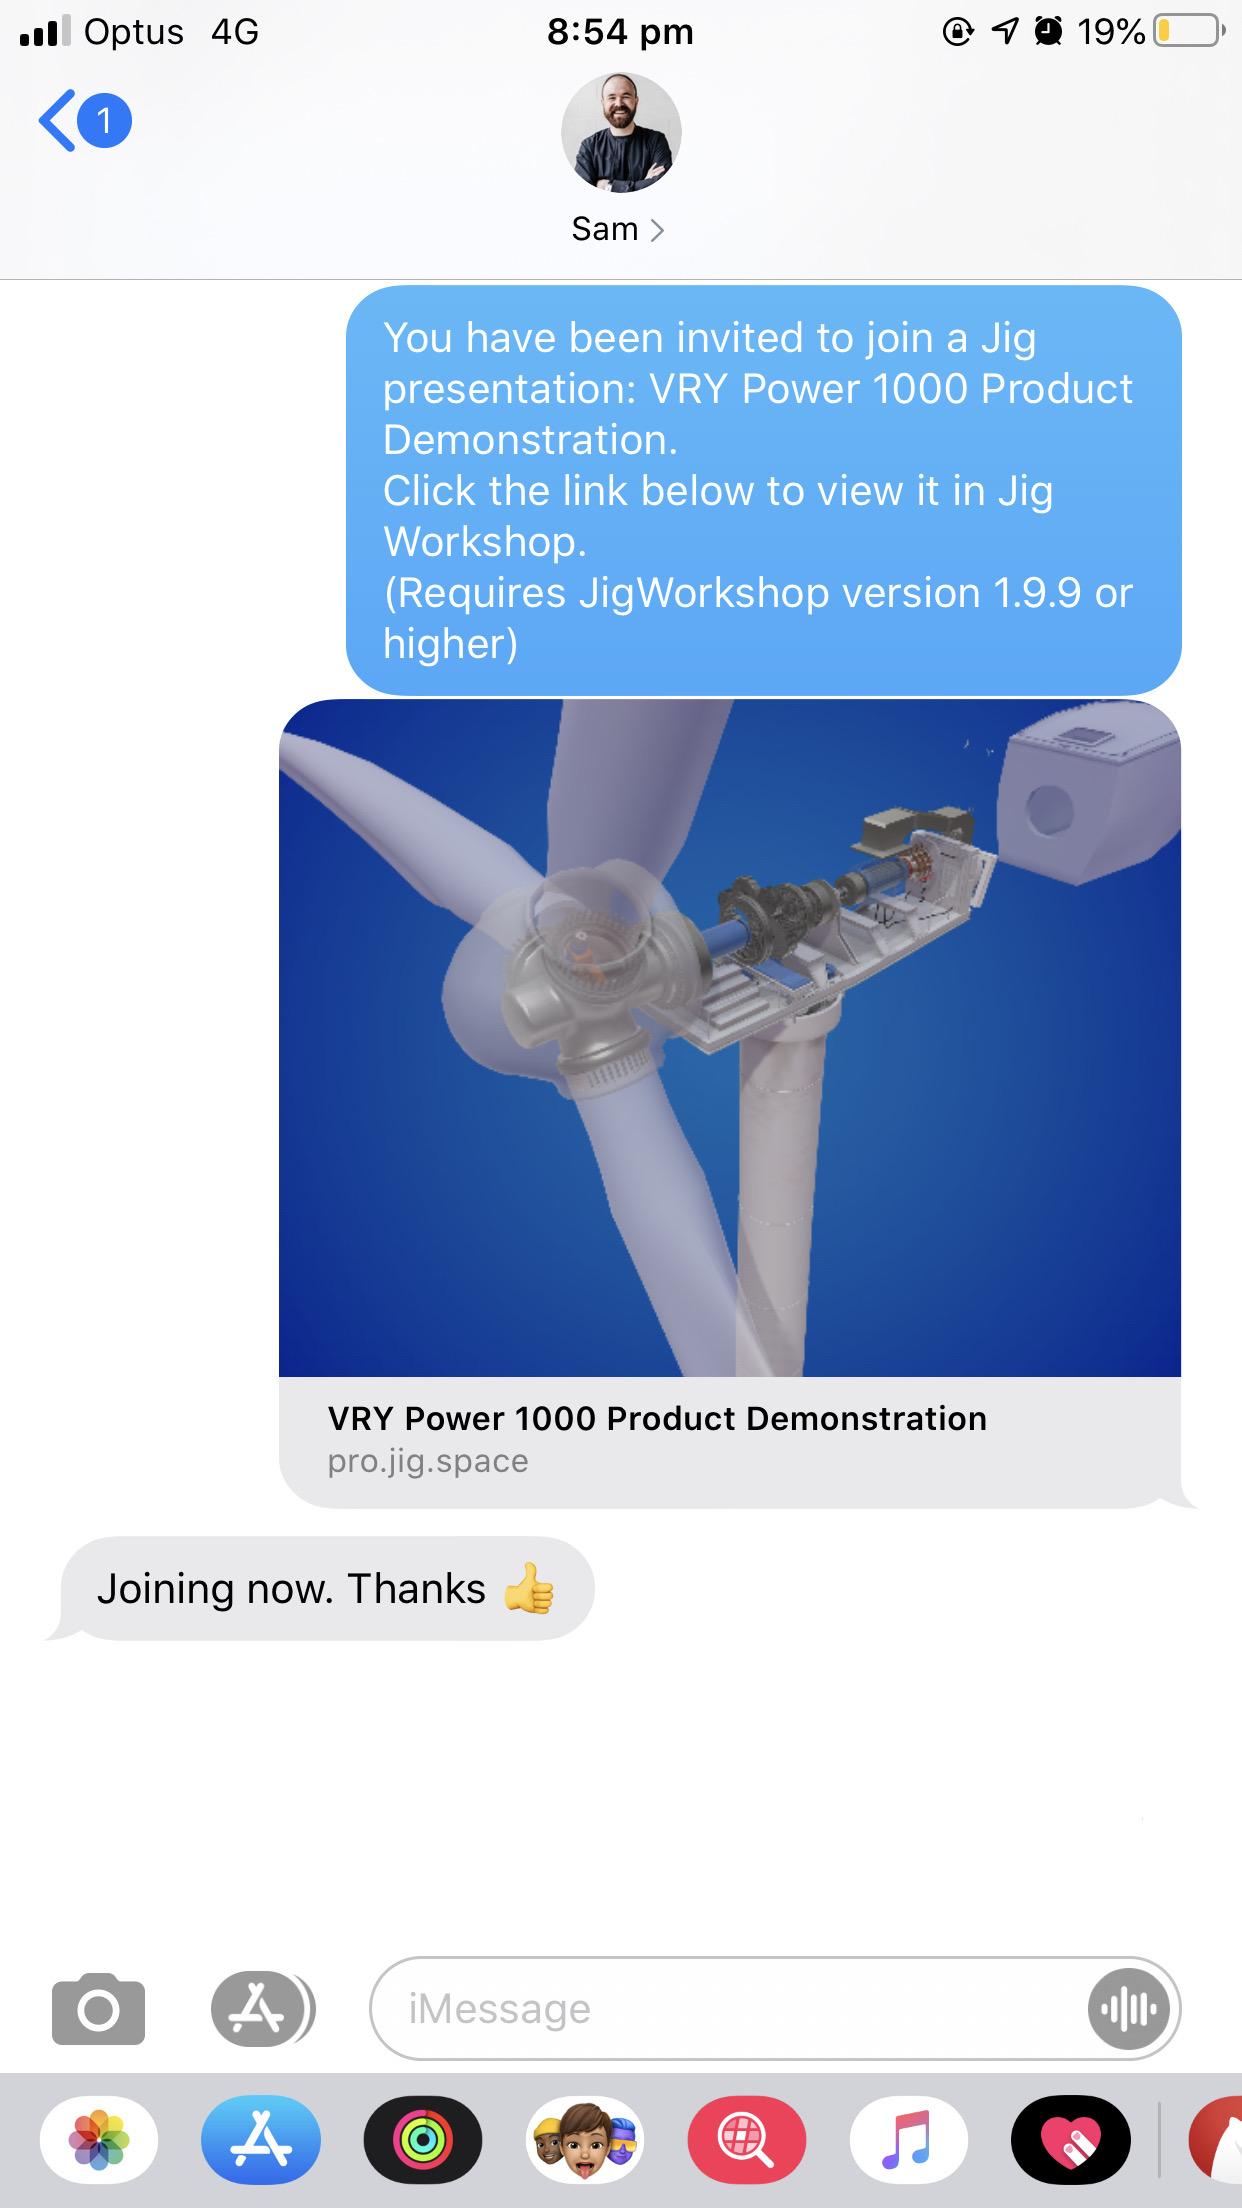 Remote-AR_5_iMessage_Jig-Workshop_Wind-Turbine